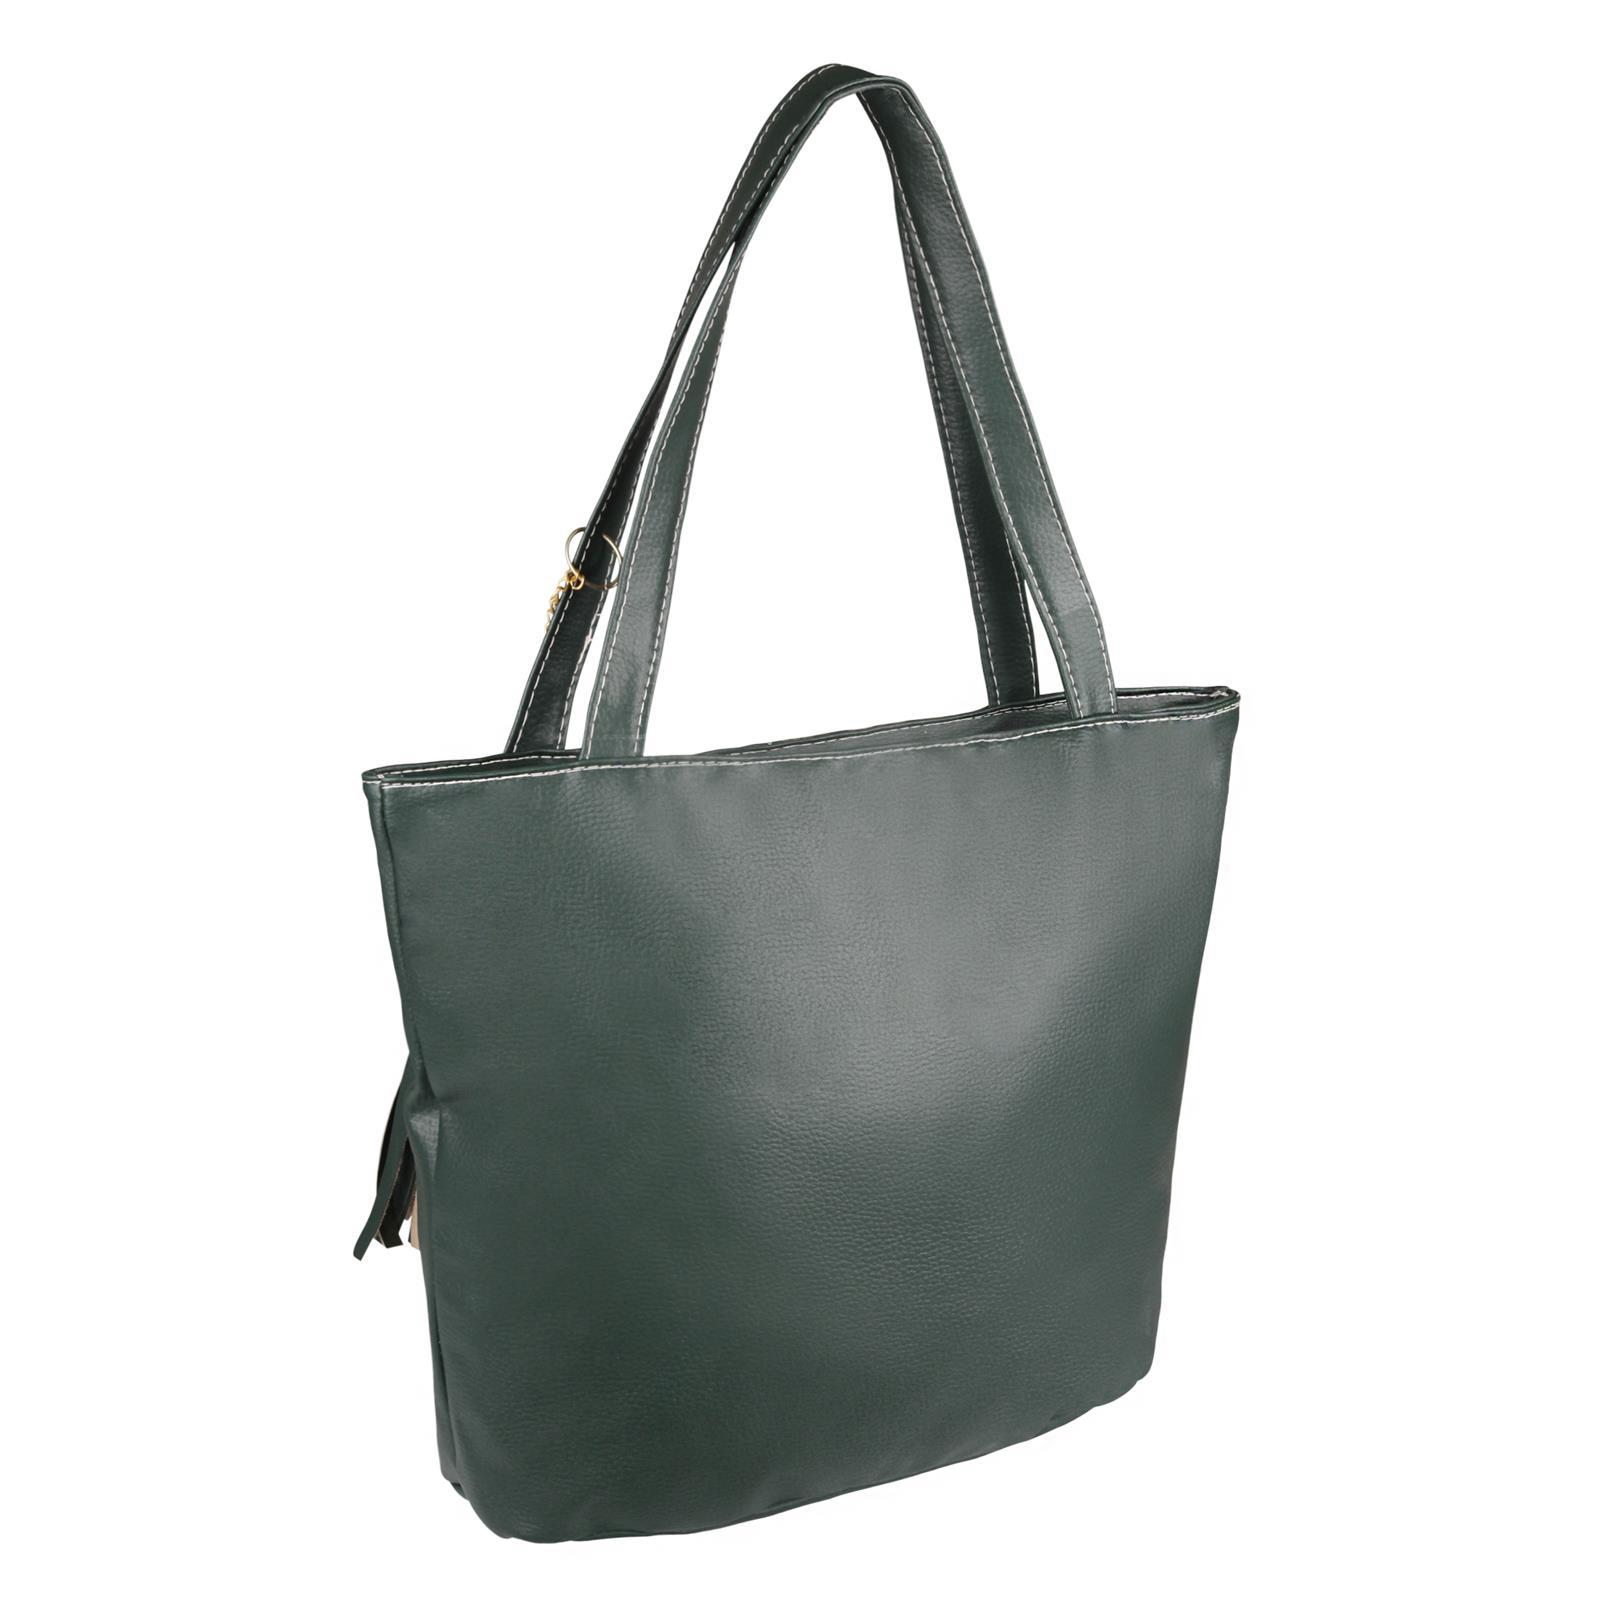 Animal-Print-Handbag-PU-Leather-Shoulder-Bag-Work-Office-Tote-Shopper-Fashion thumbnail 10